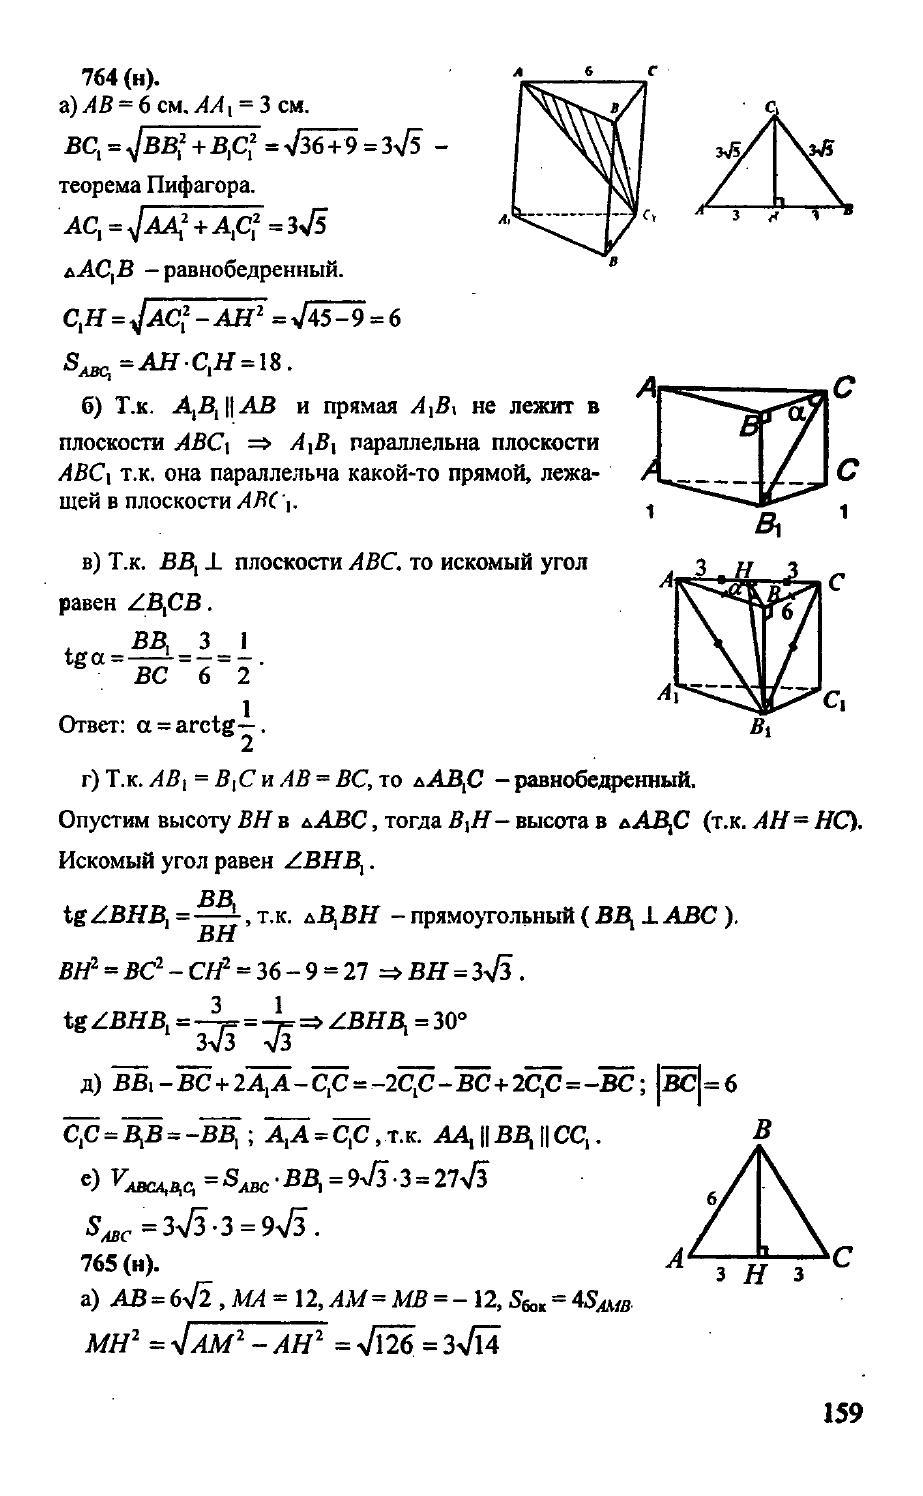 Гдзпо алгебре класс мордкович срочно чтоб только прпечатол